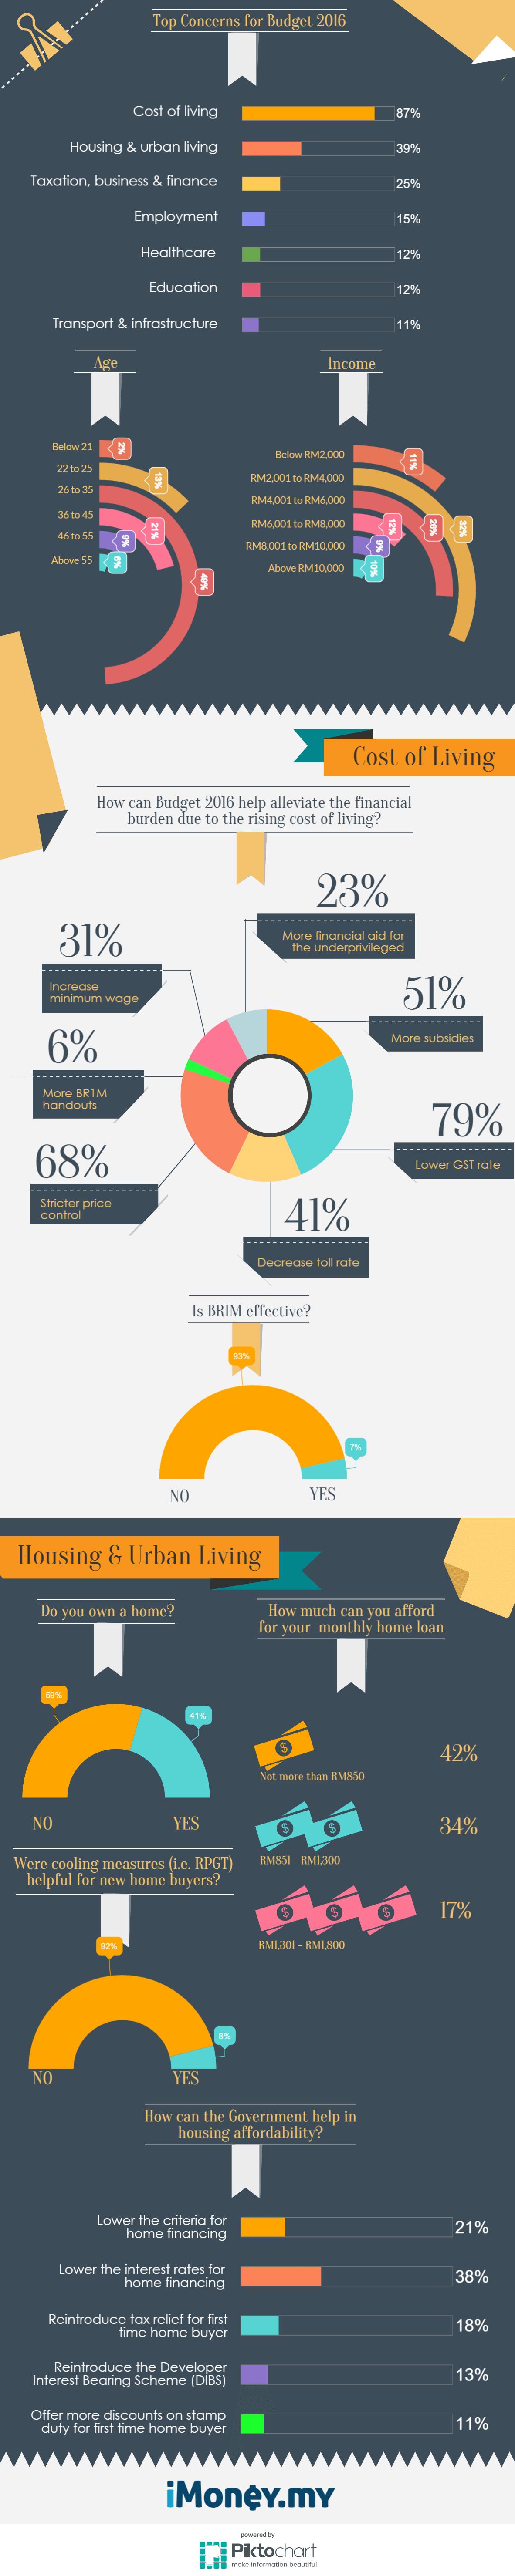 Budget 2016 Survey Results